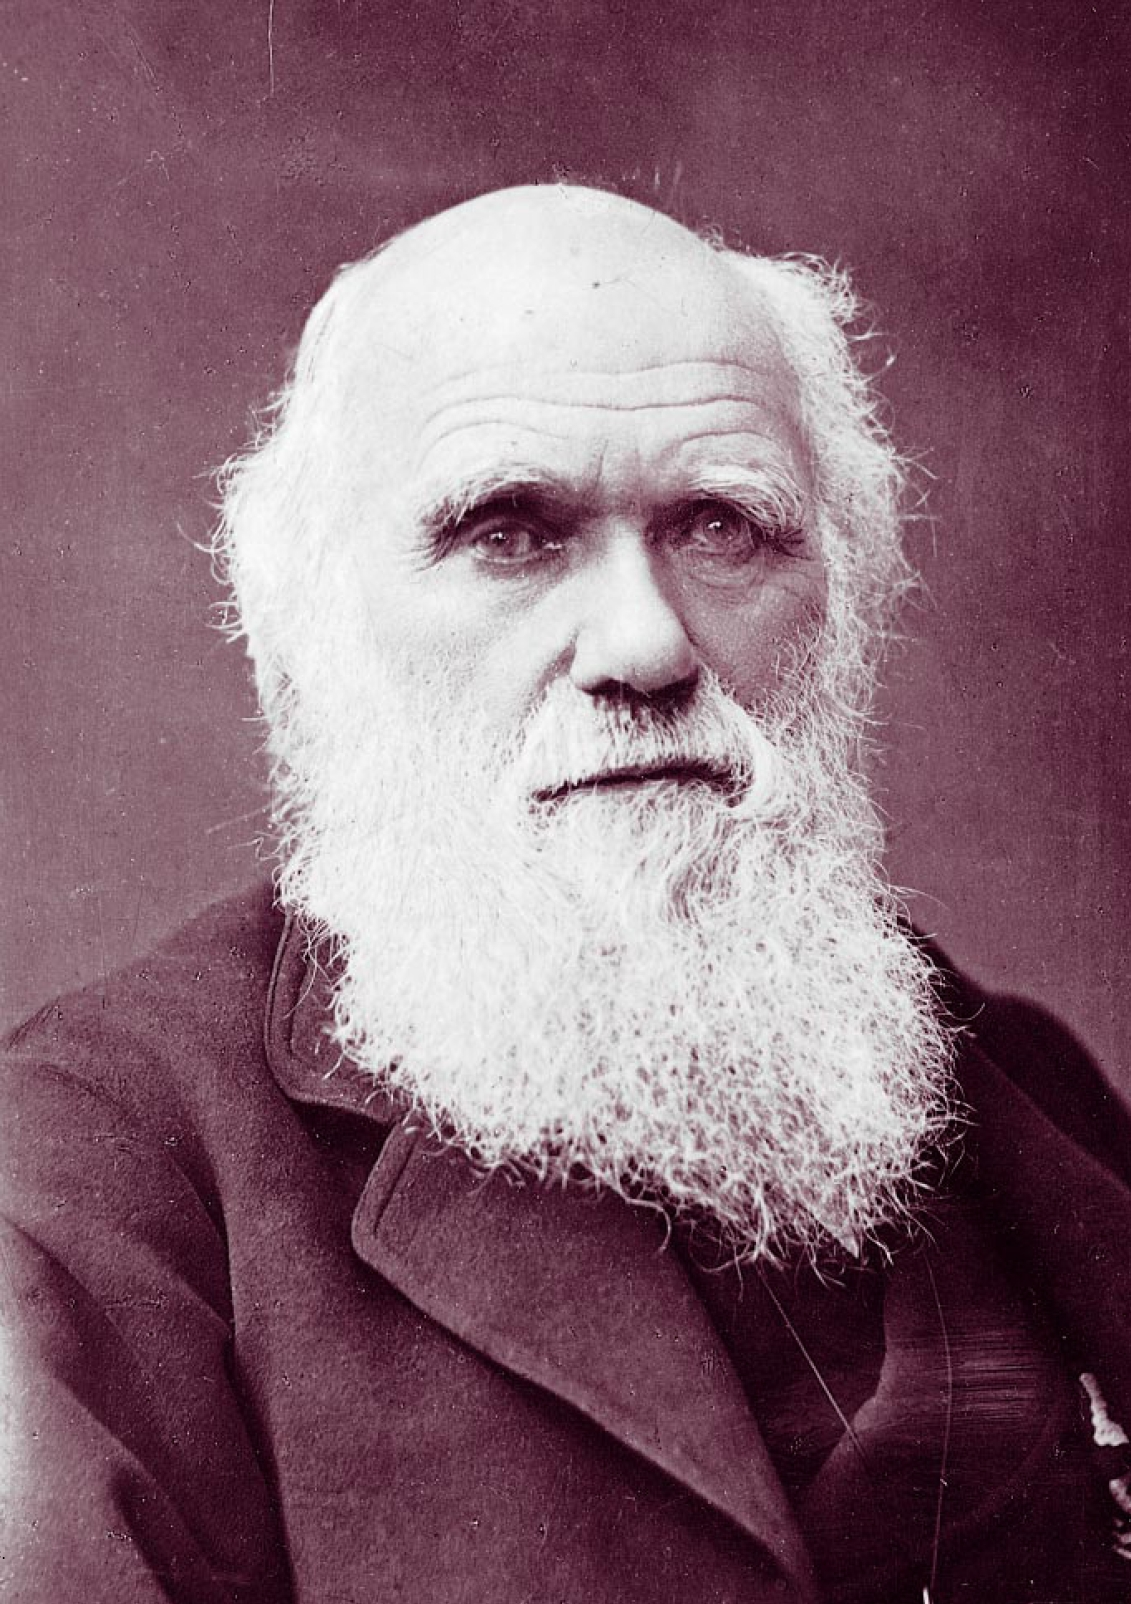 Charles_Darwin_photograph_by_Herbert_Rose_Barraud,_1881_2 -